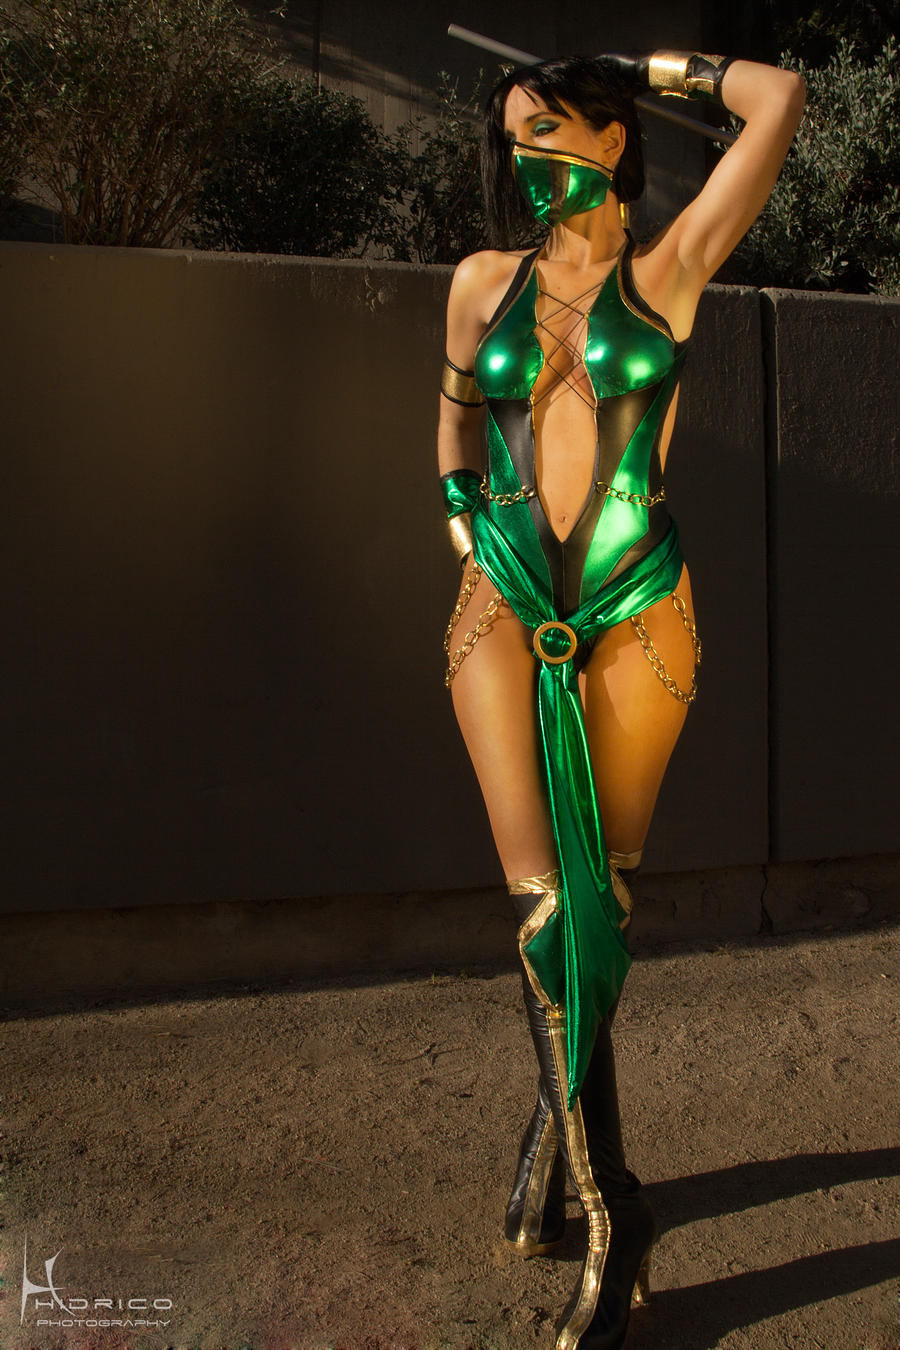 Mortal Kombat 9 - Jade by DawnArts